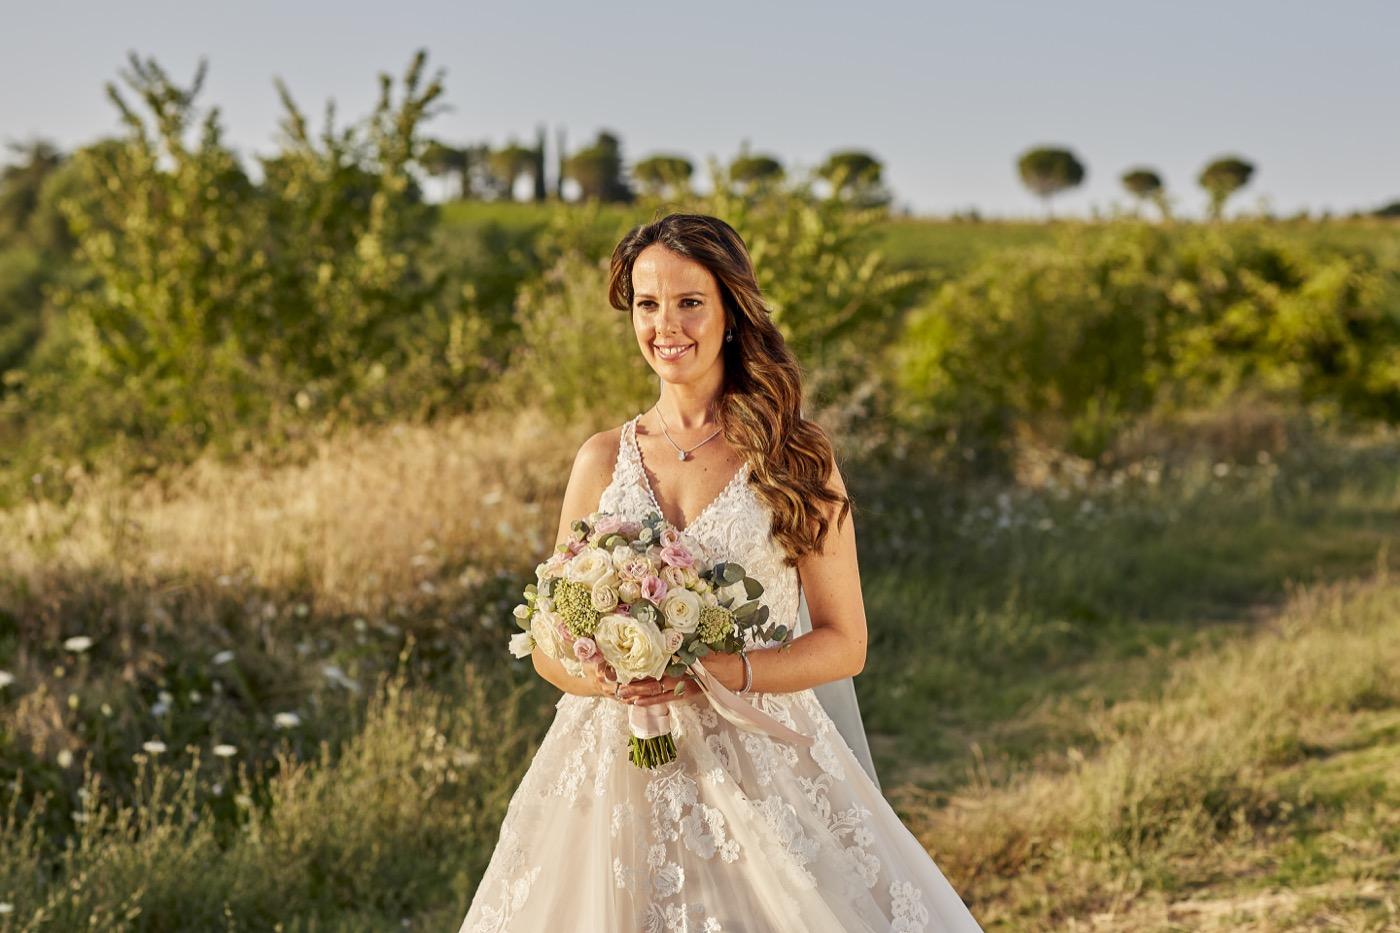 Claudio-Coppola-wedding-photographer-la-scuderia-eventi-preparativi-la-rosetta-perugia-66